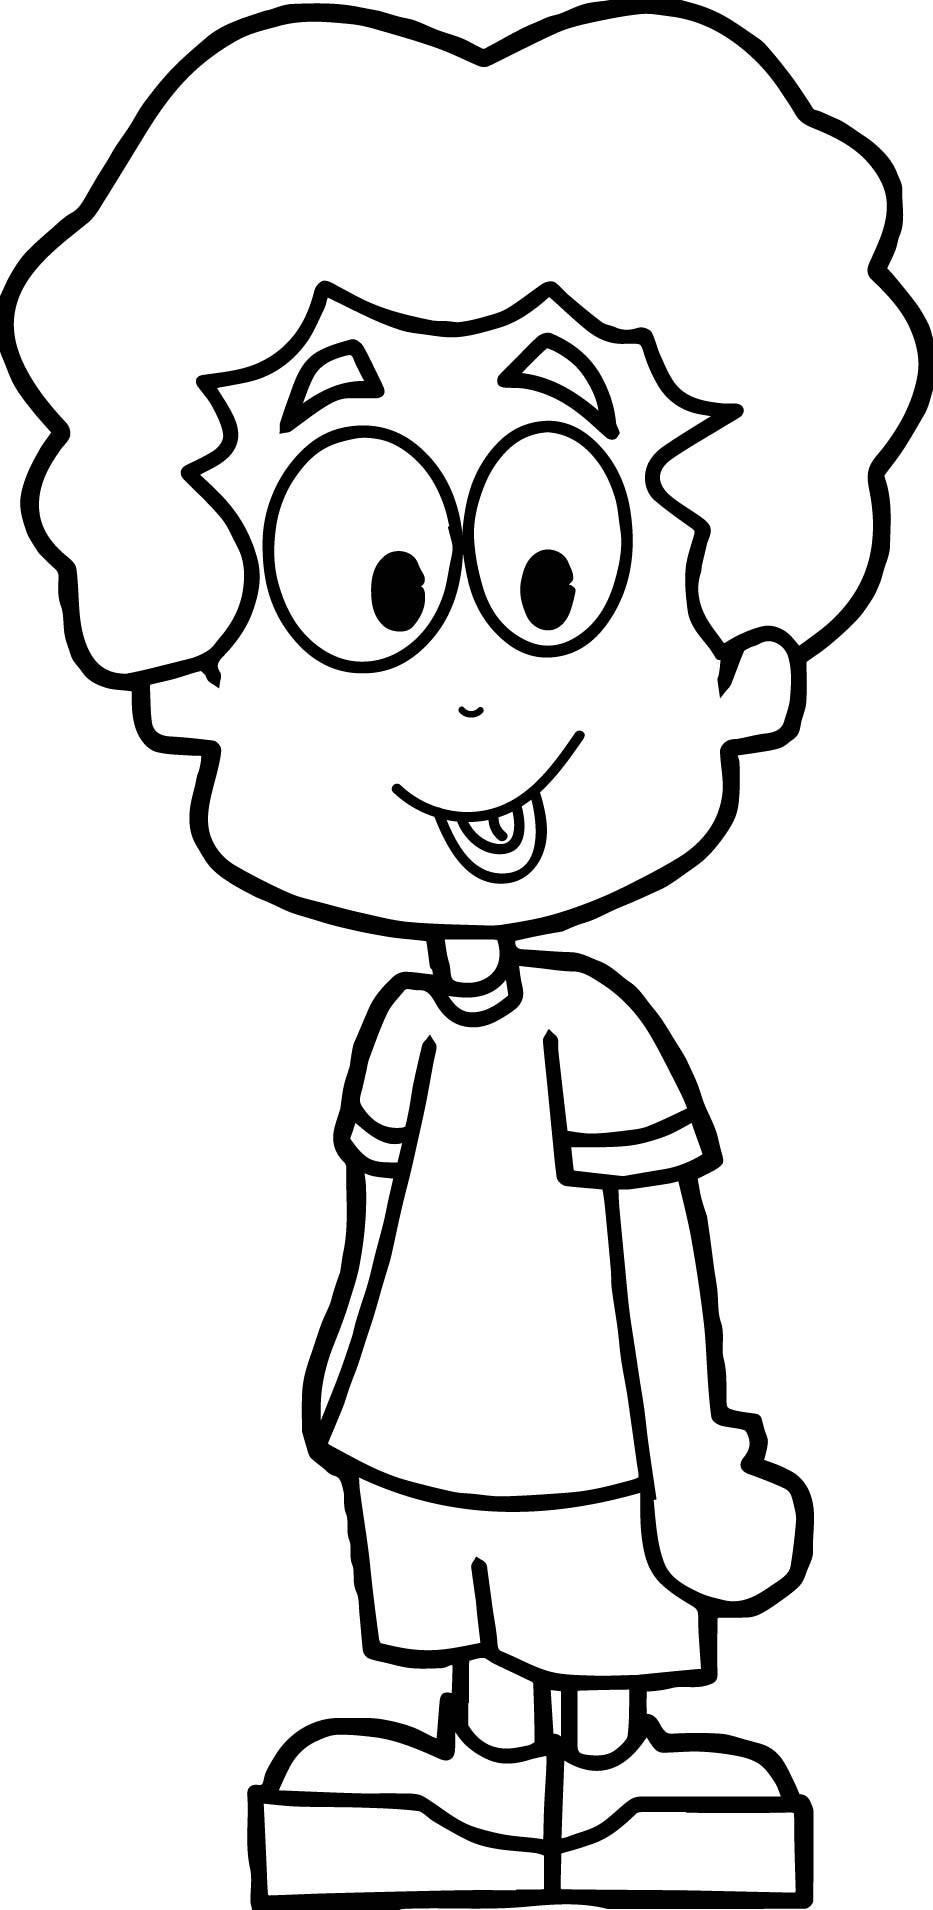 Boys Coloring Pages  Cartoon Boy Coloring Page